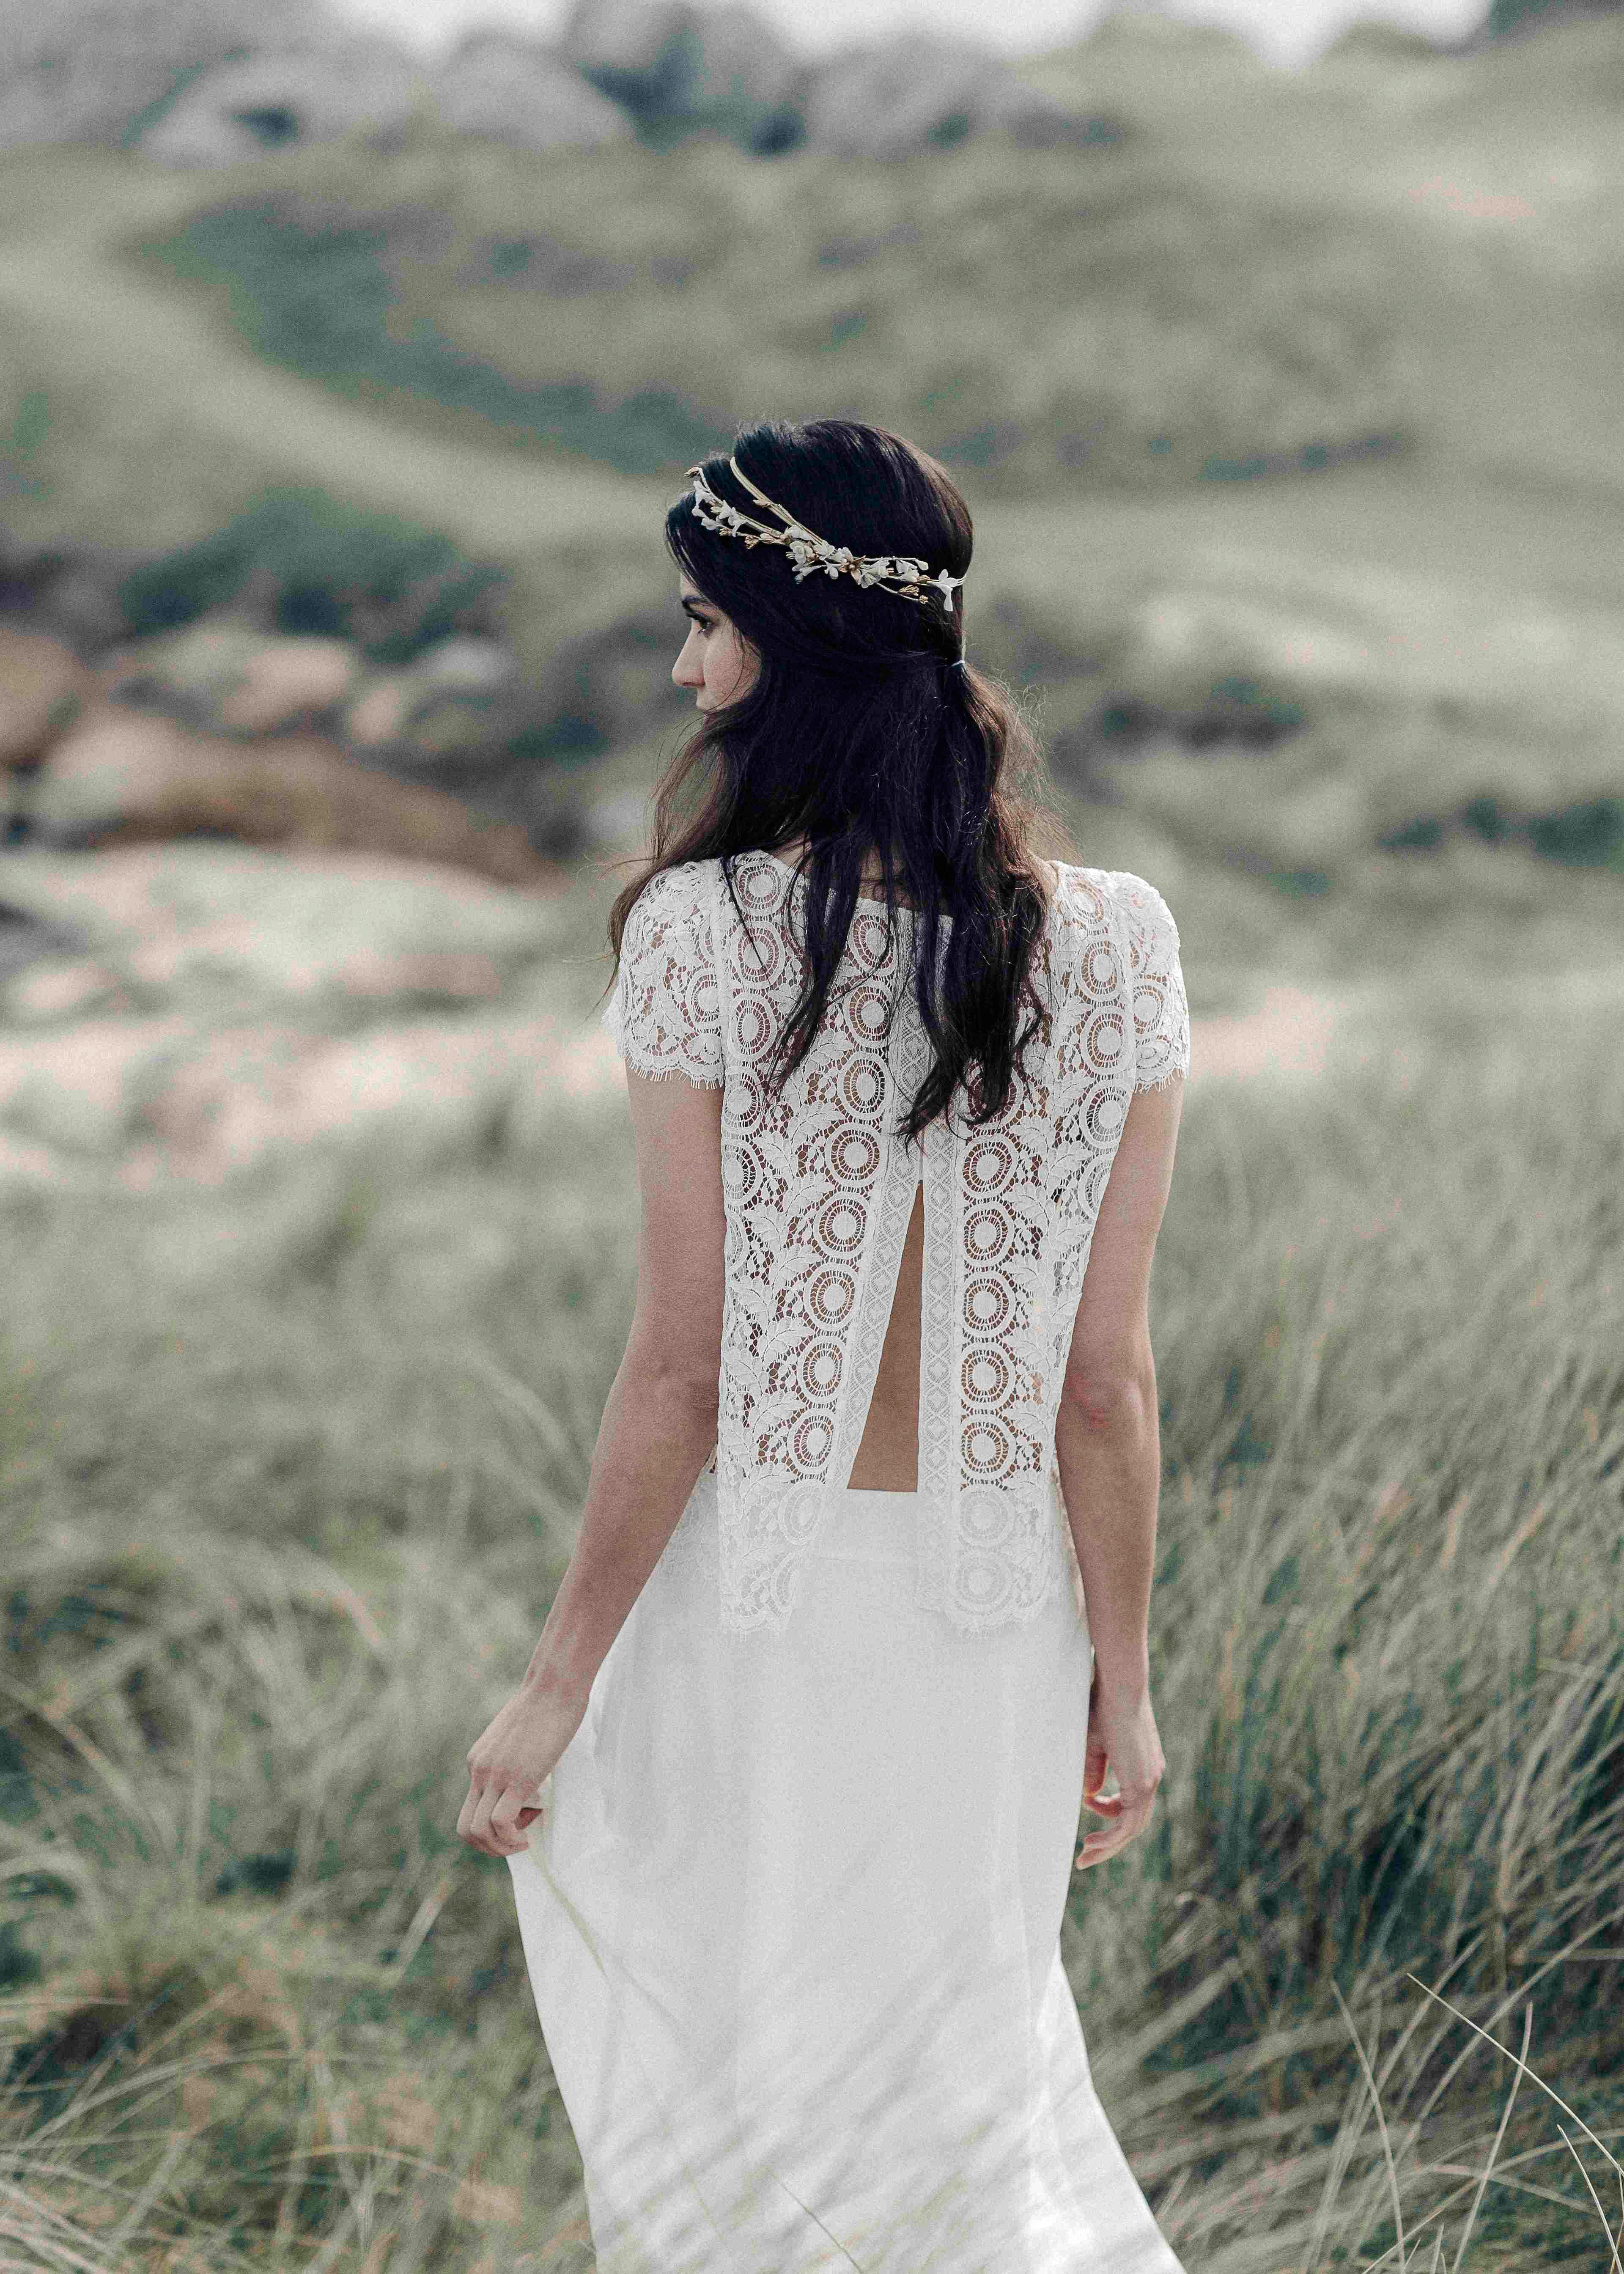 laure de sagazan lace back spring 2018 wedding dress